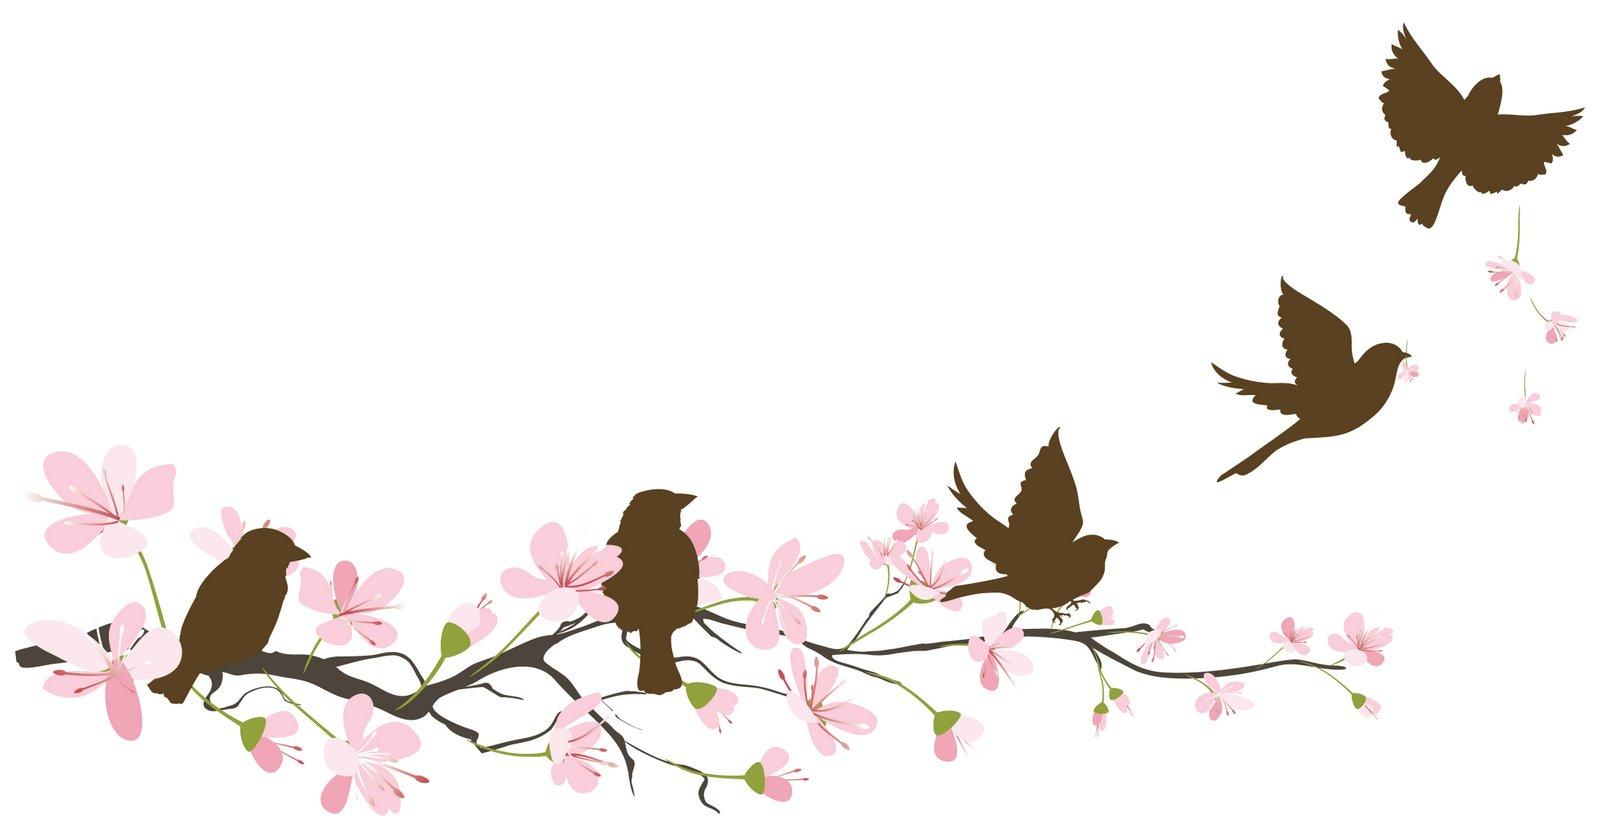 [Buble+Nest+Image.jpg]